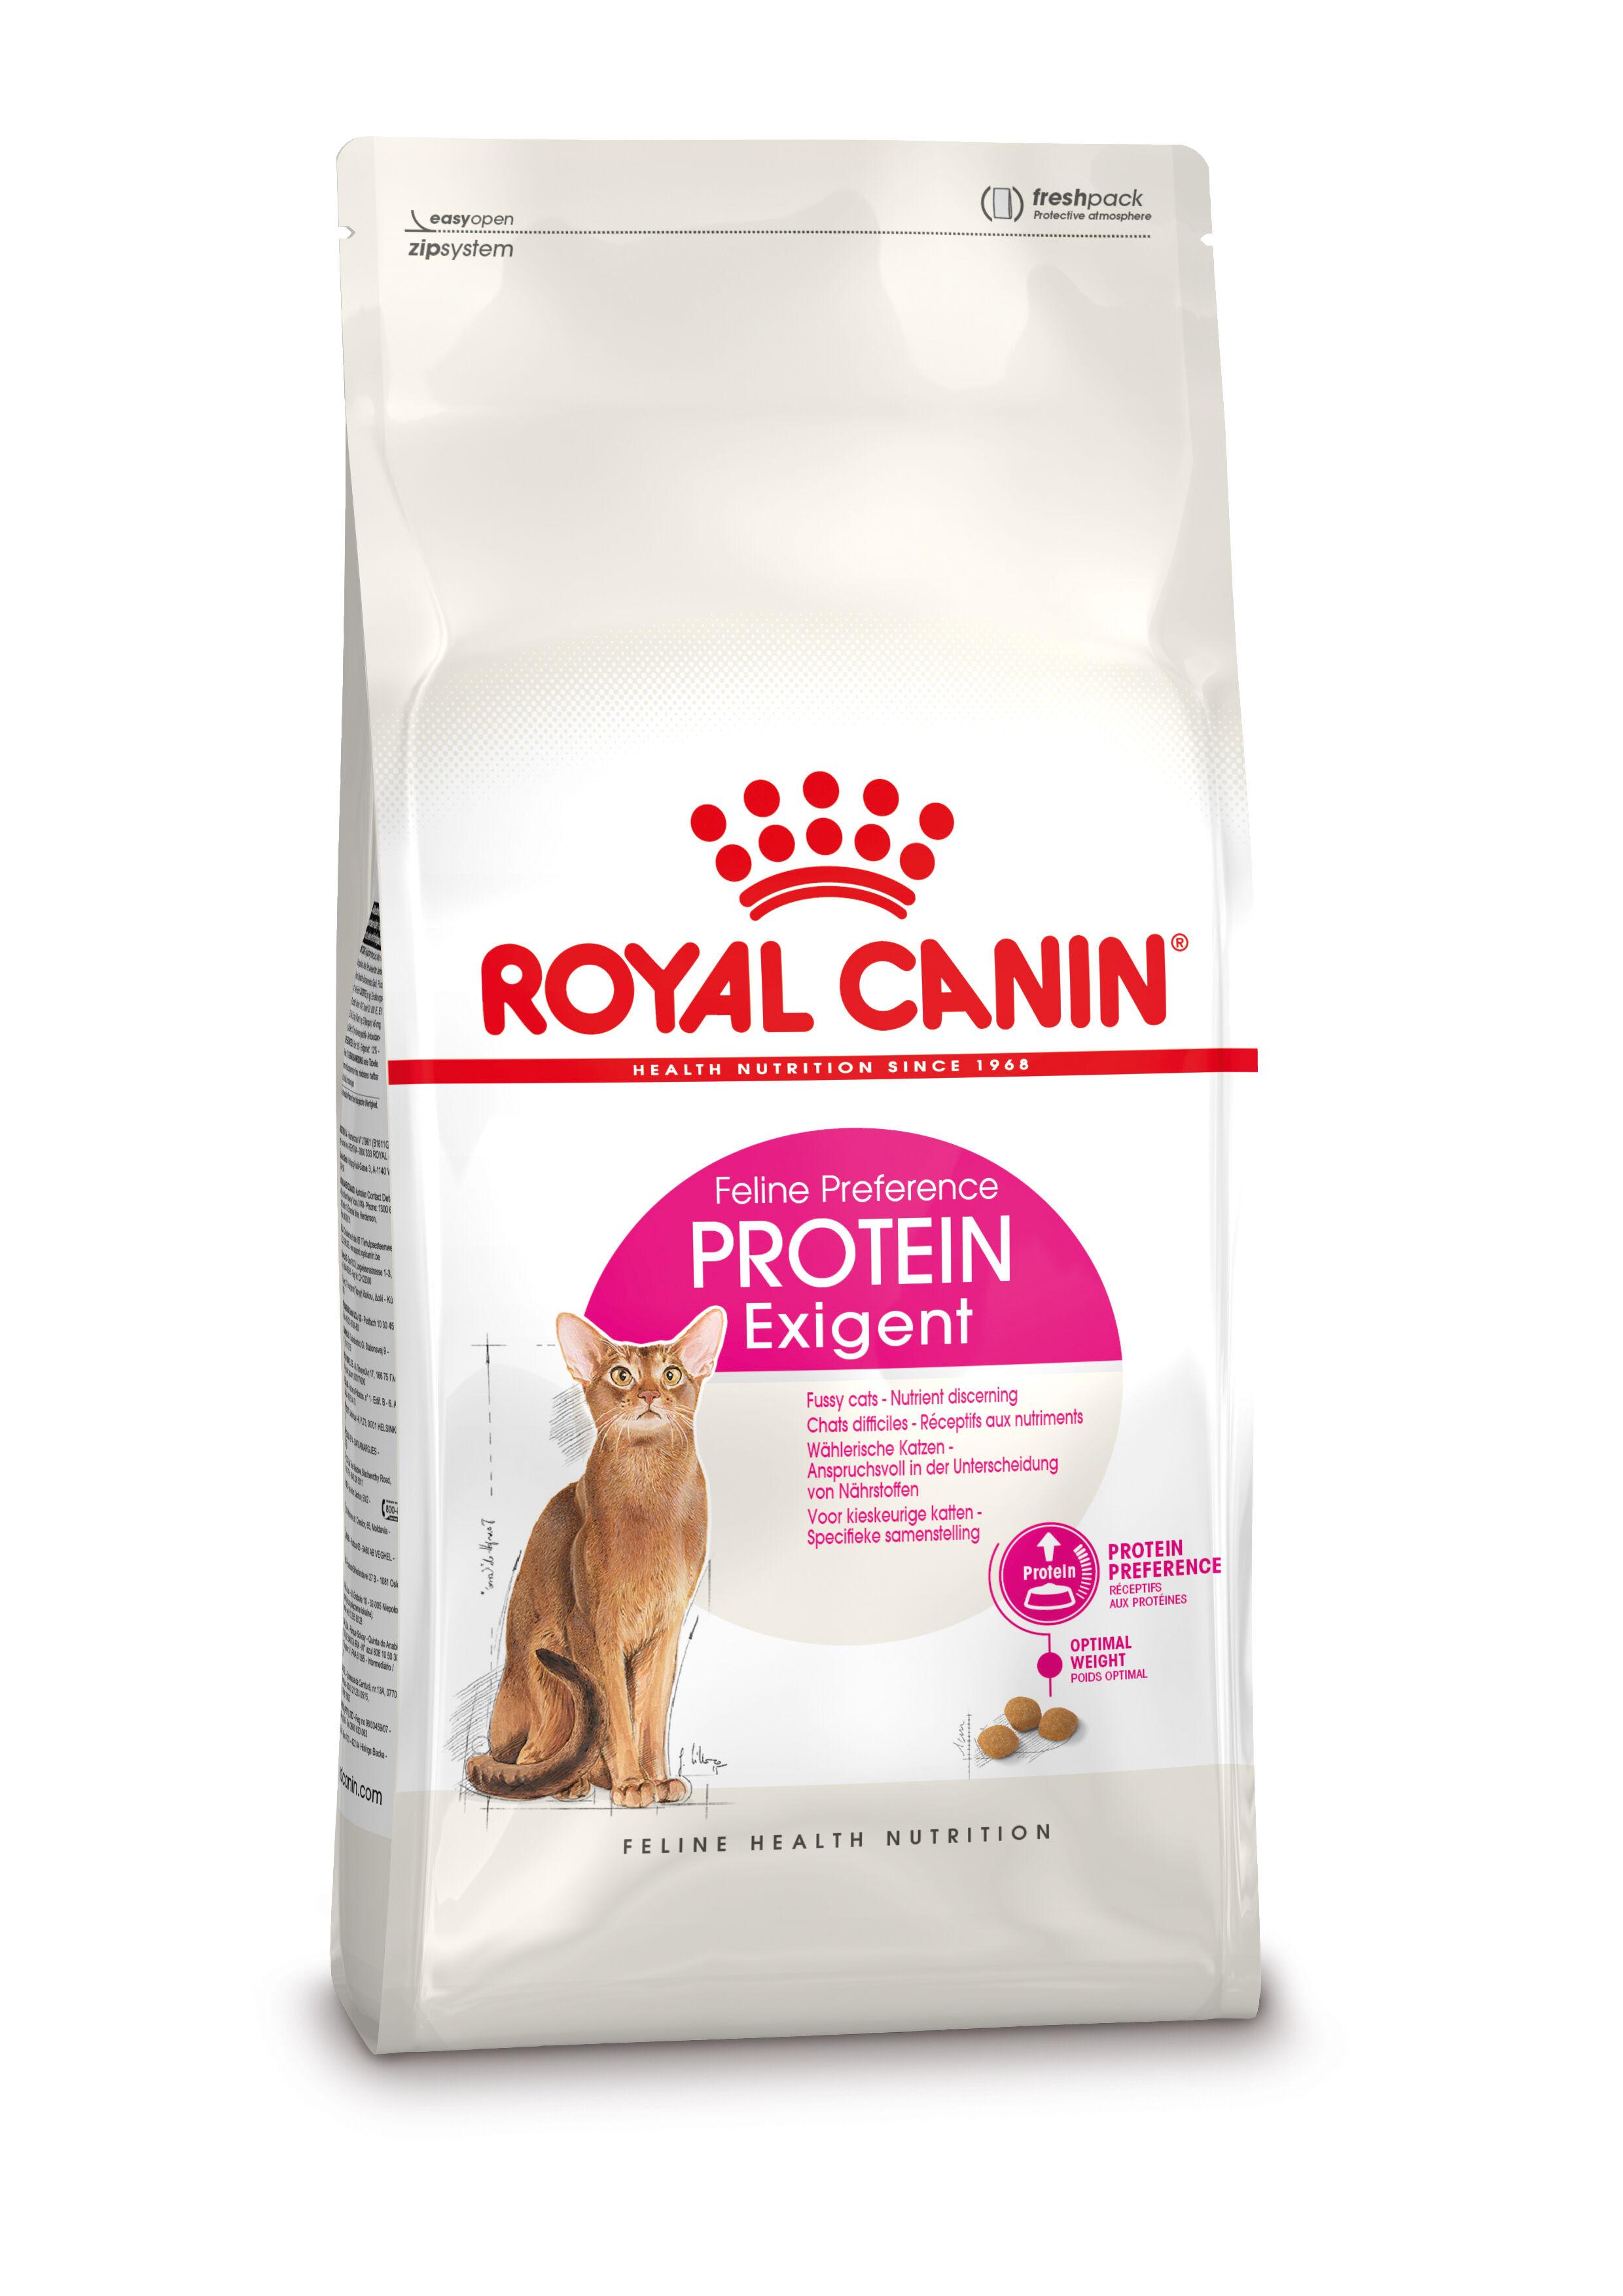 Royal Canin Protein Exigent Katzenfutter 2 x 10 kg